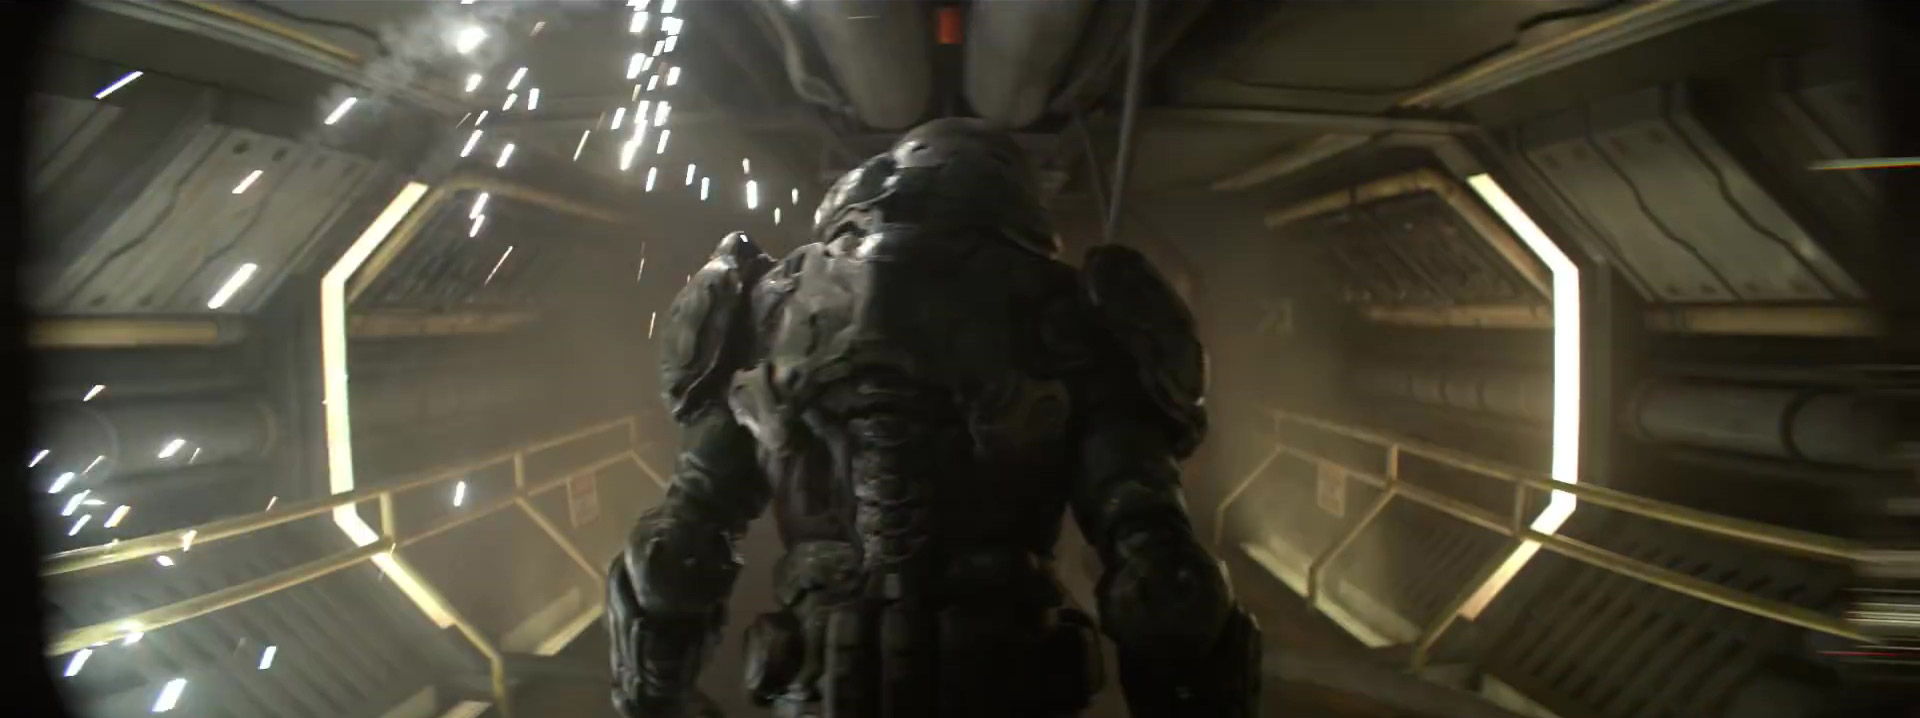 doom-2016-video-game-trailer-1